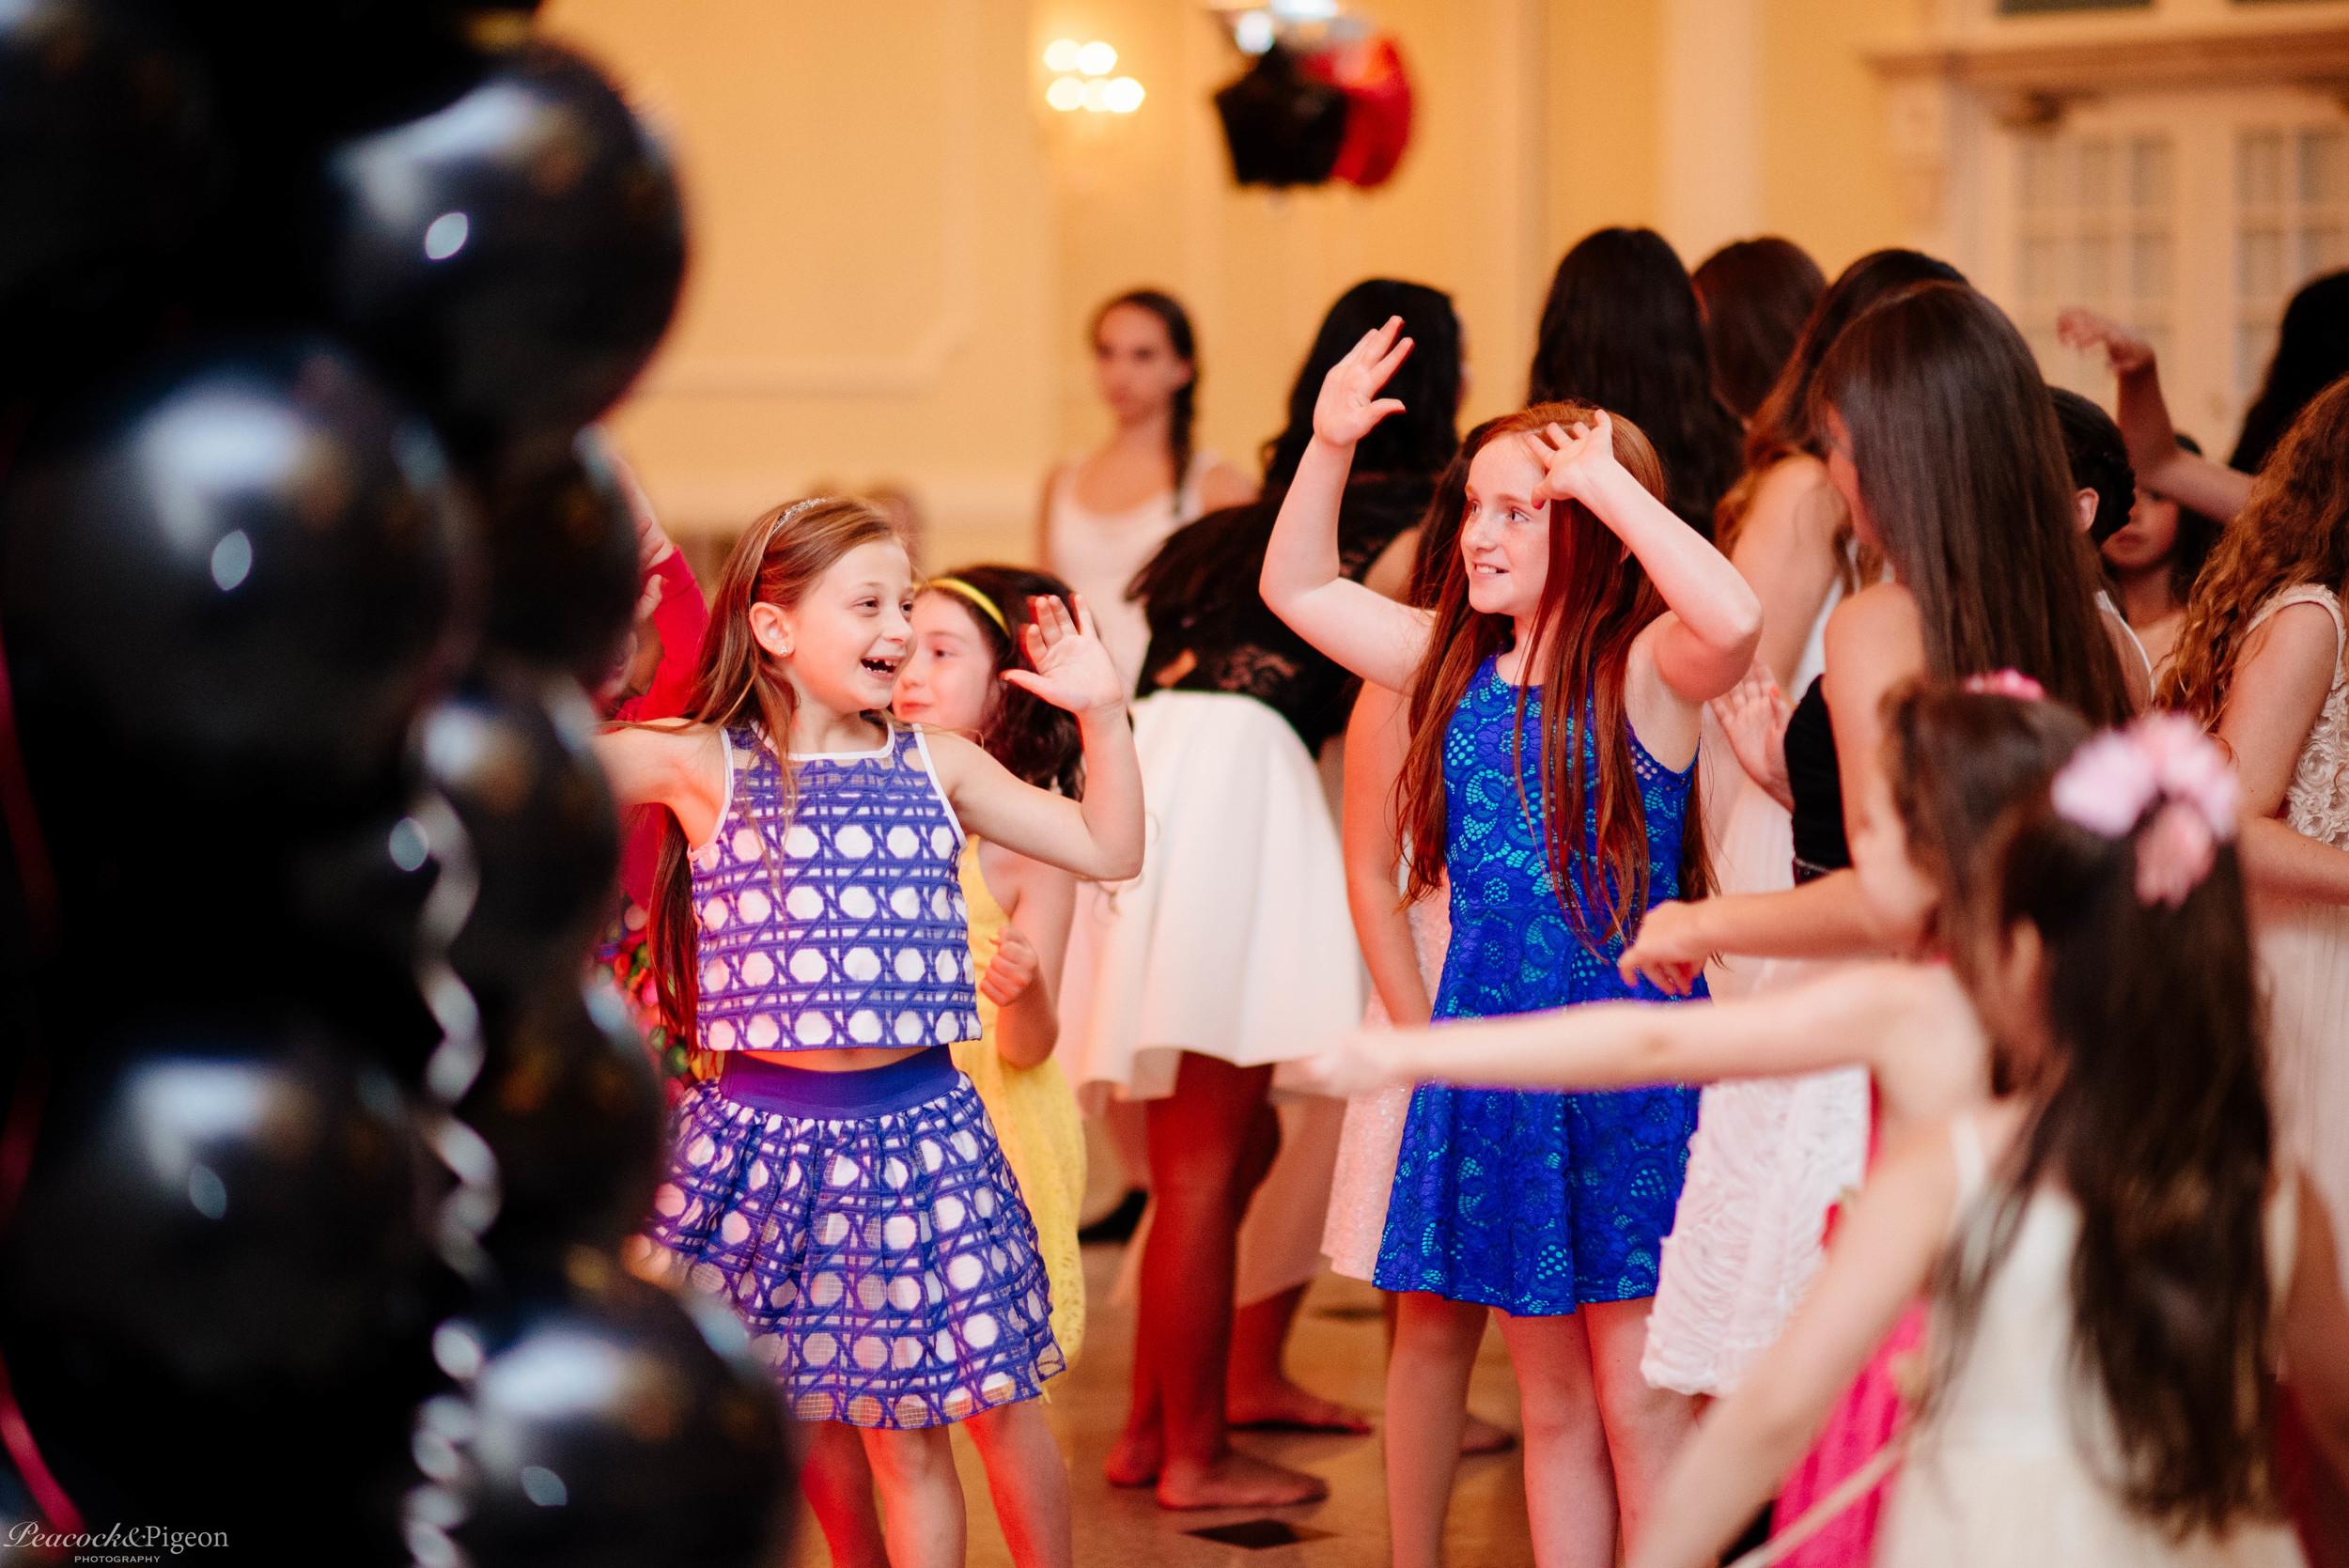 Next_Level_All_Star_Dance_School_Part_Two-W-19-130.jpg